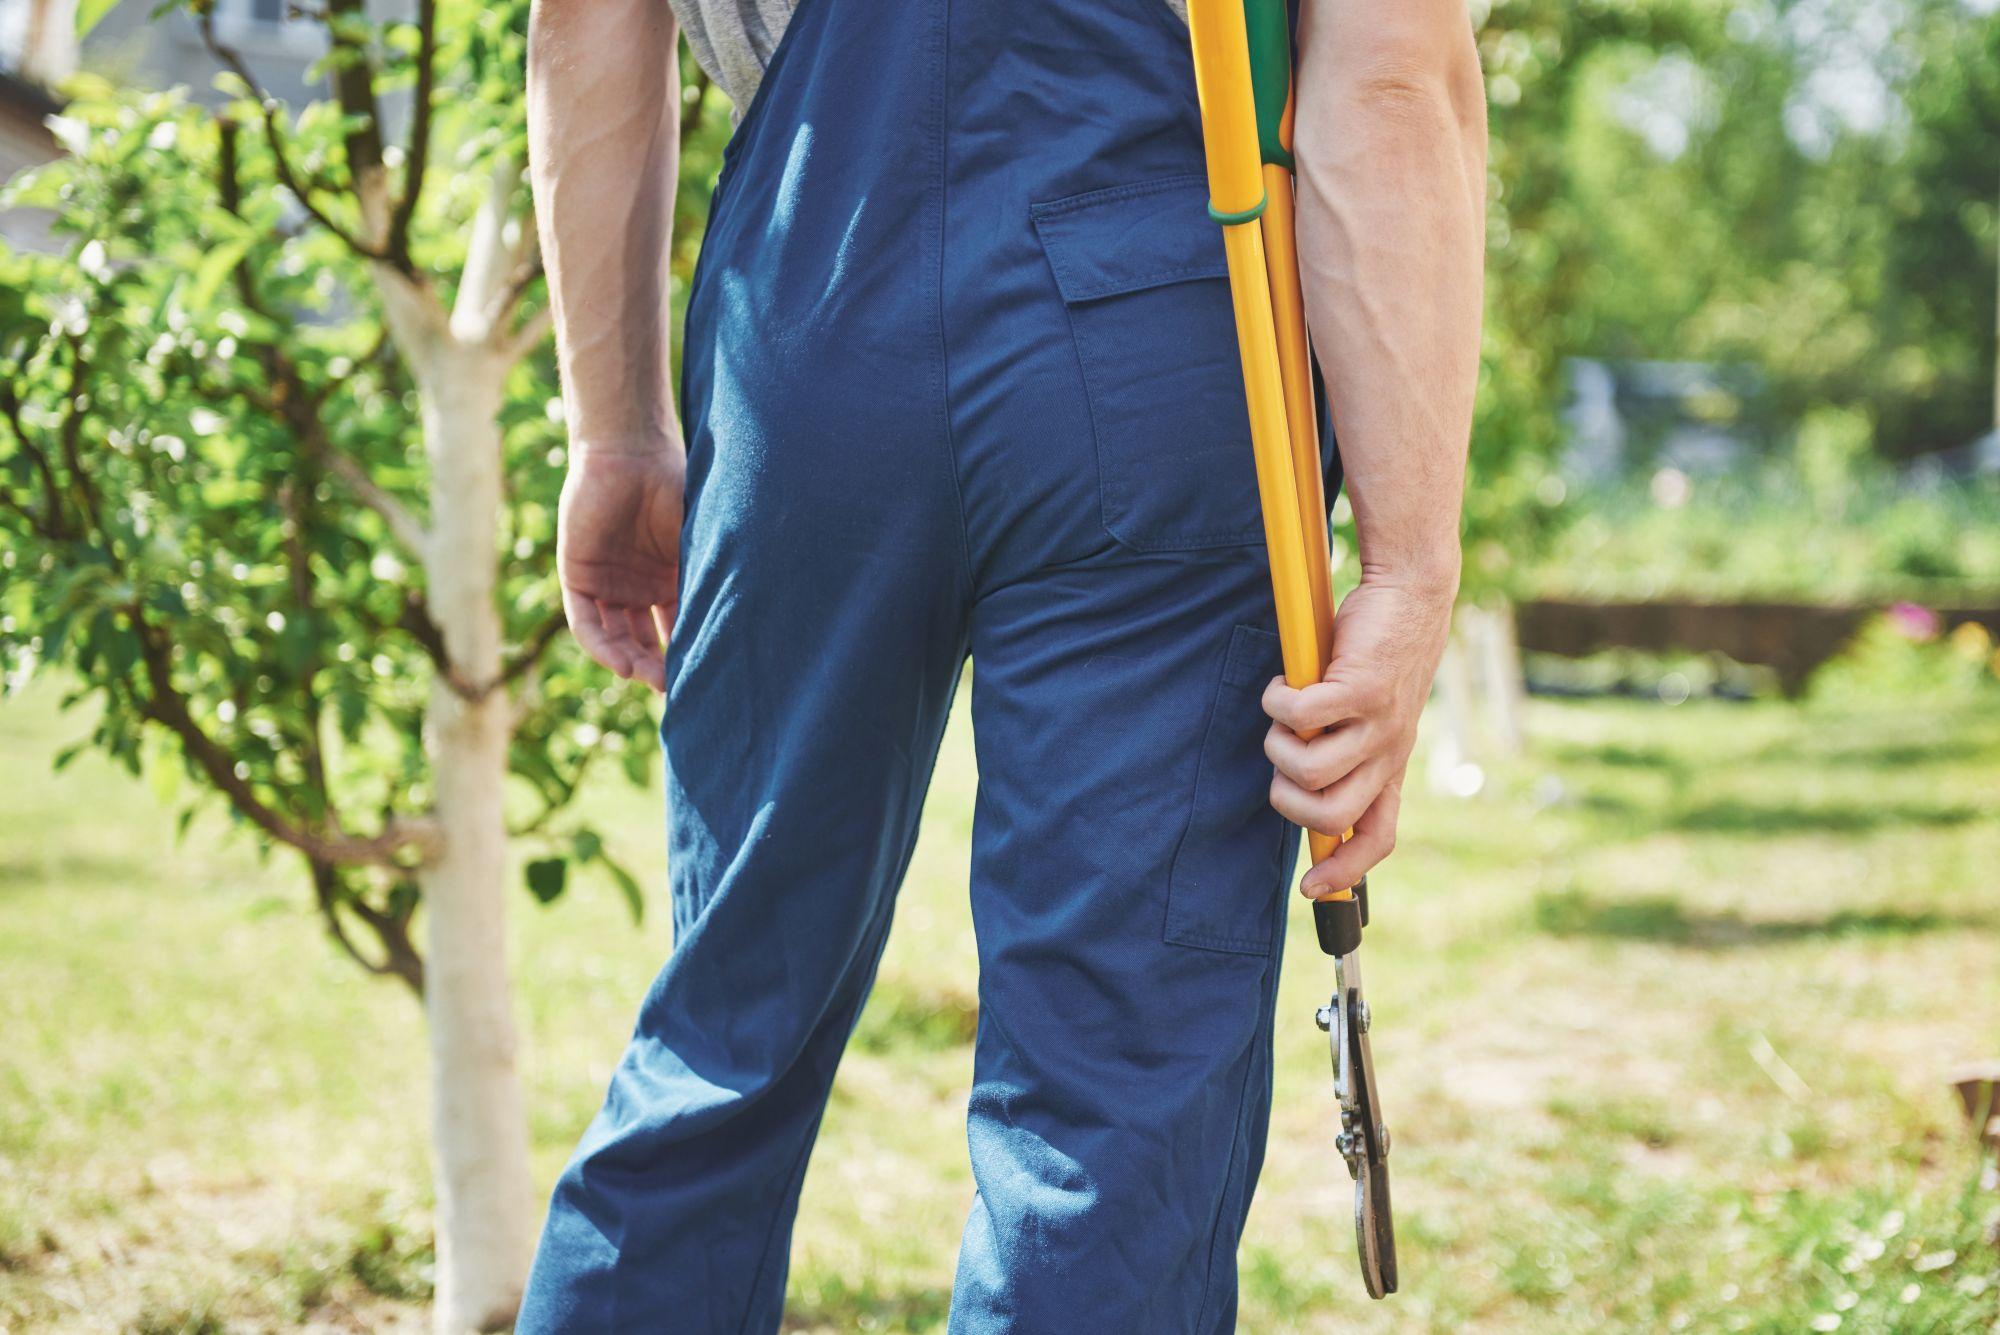 a-professional-gardener-at-work-cuts-fruit-trees-GA2TUFQ